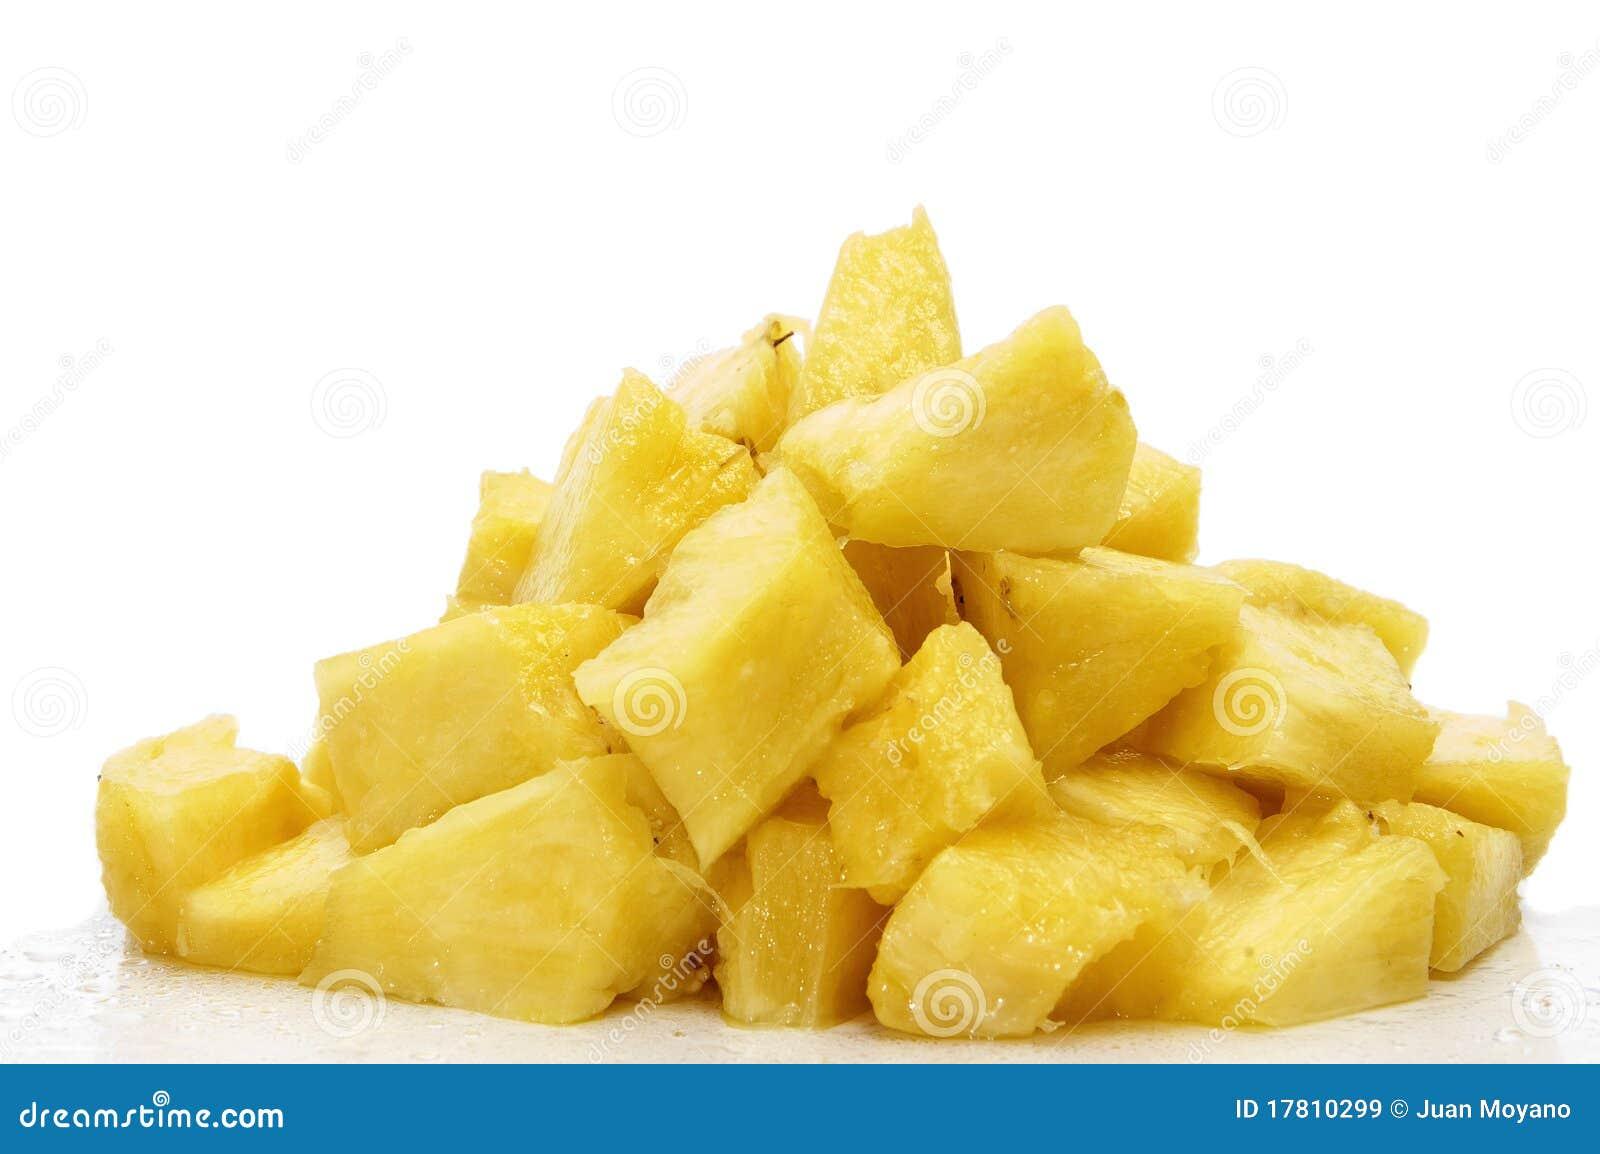 Pineapple Cake With Fresh Pineapple